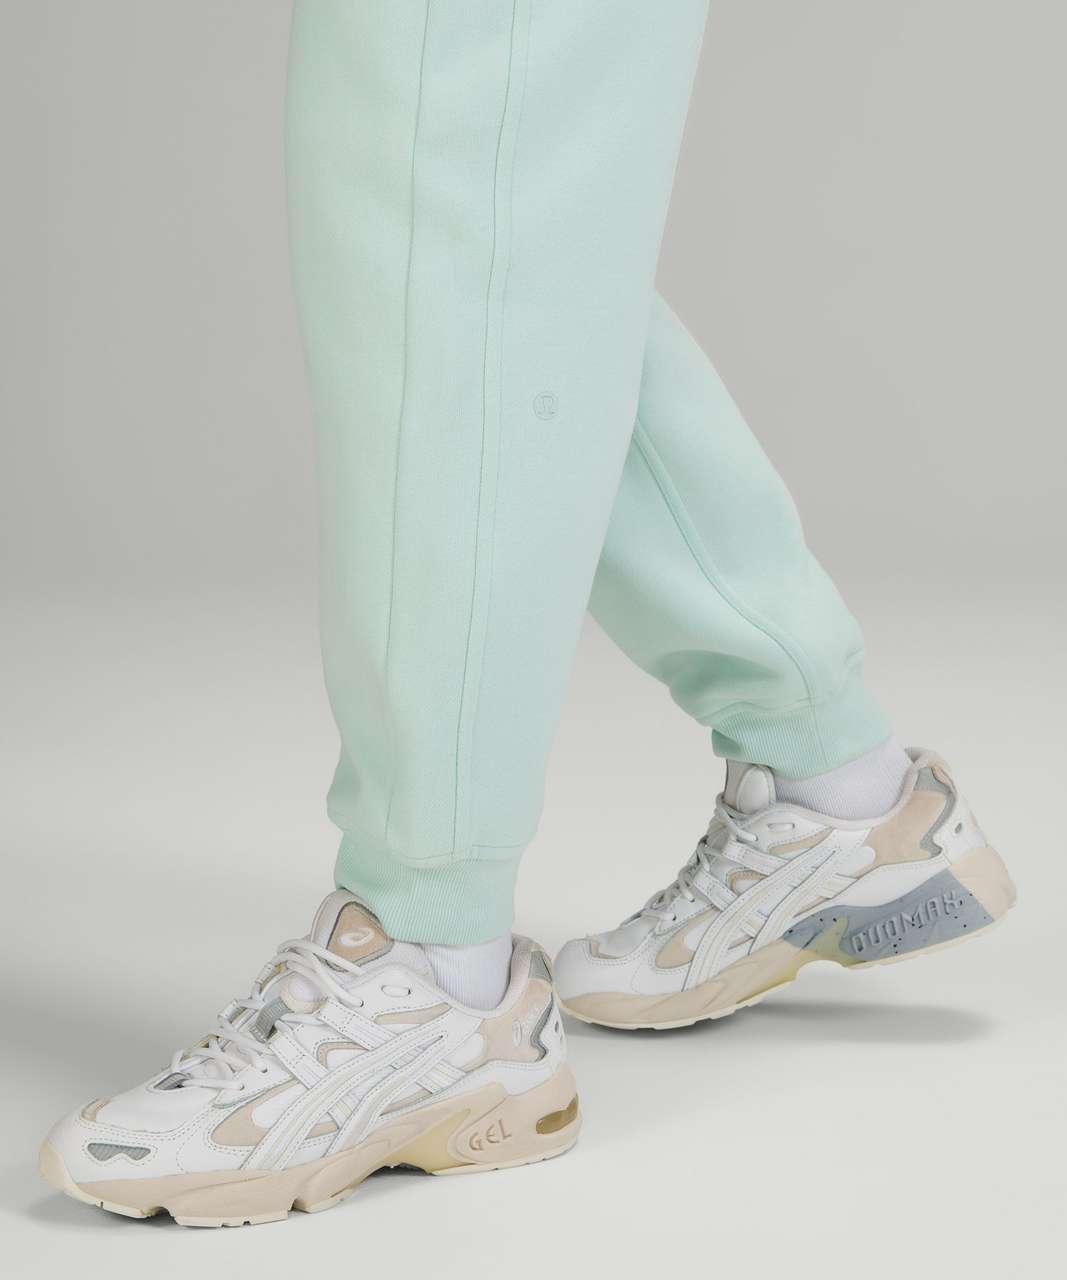 Lululemon Scuba Relaxed High-Rise Jogger - Delicate Mint